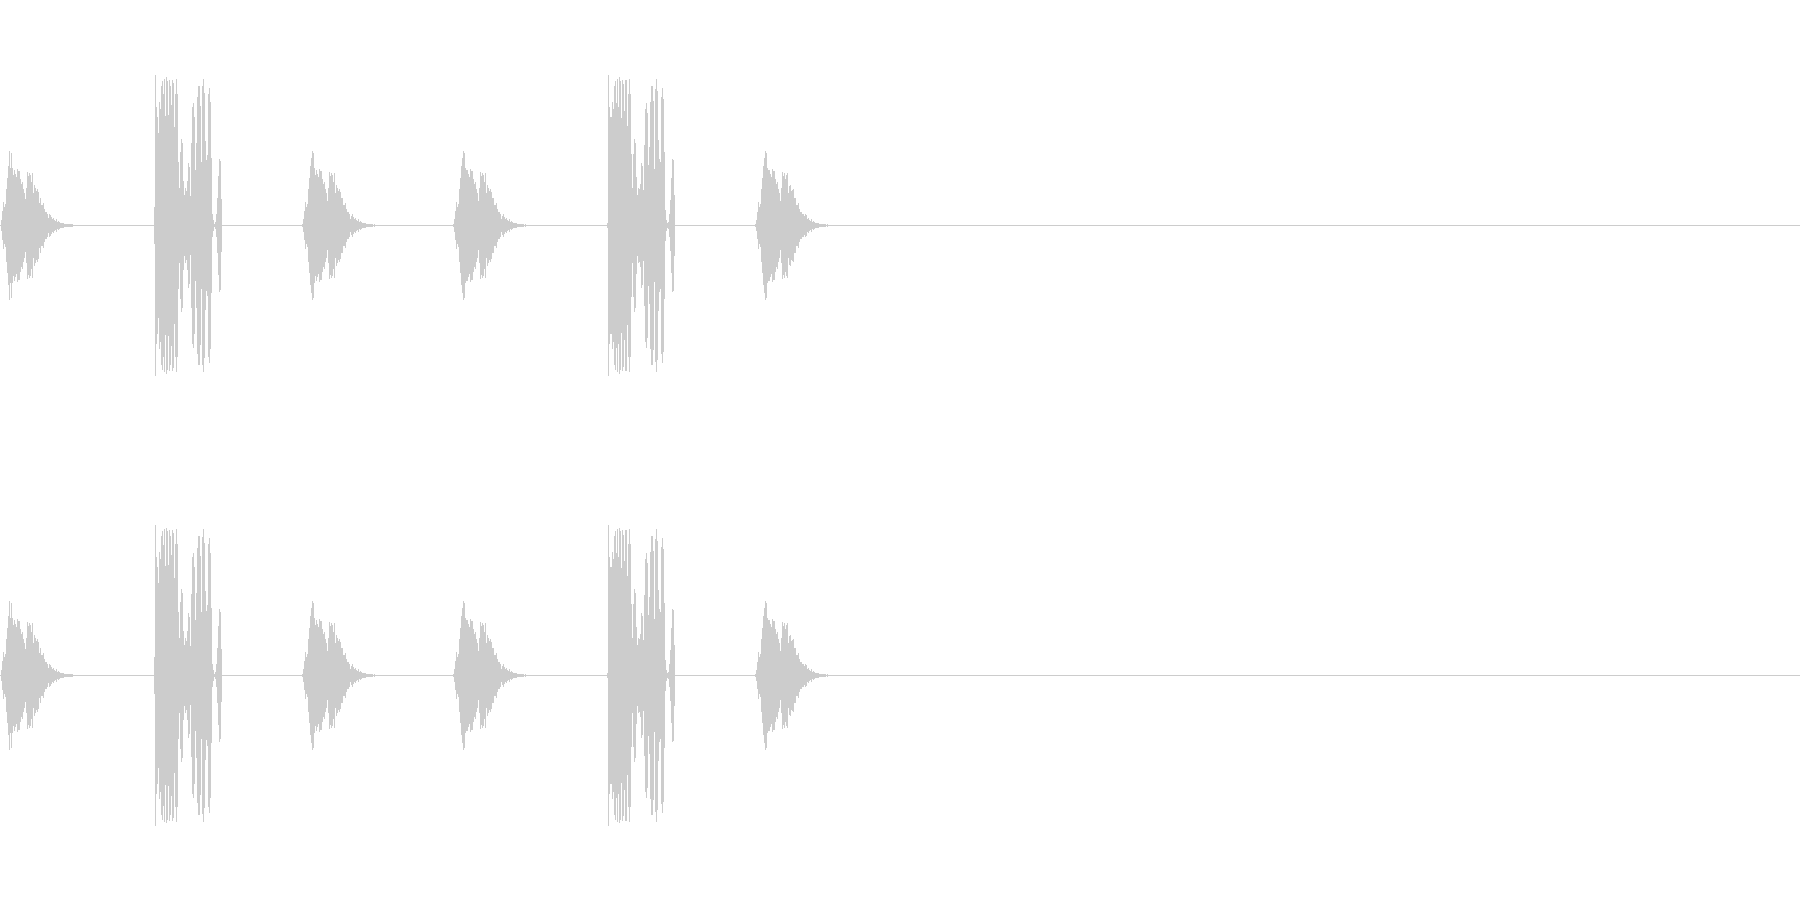 DJスクラッチ/ターンテーブル/E-15の未再生の波形